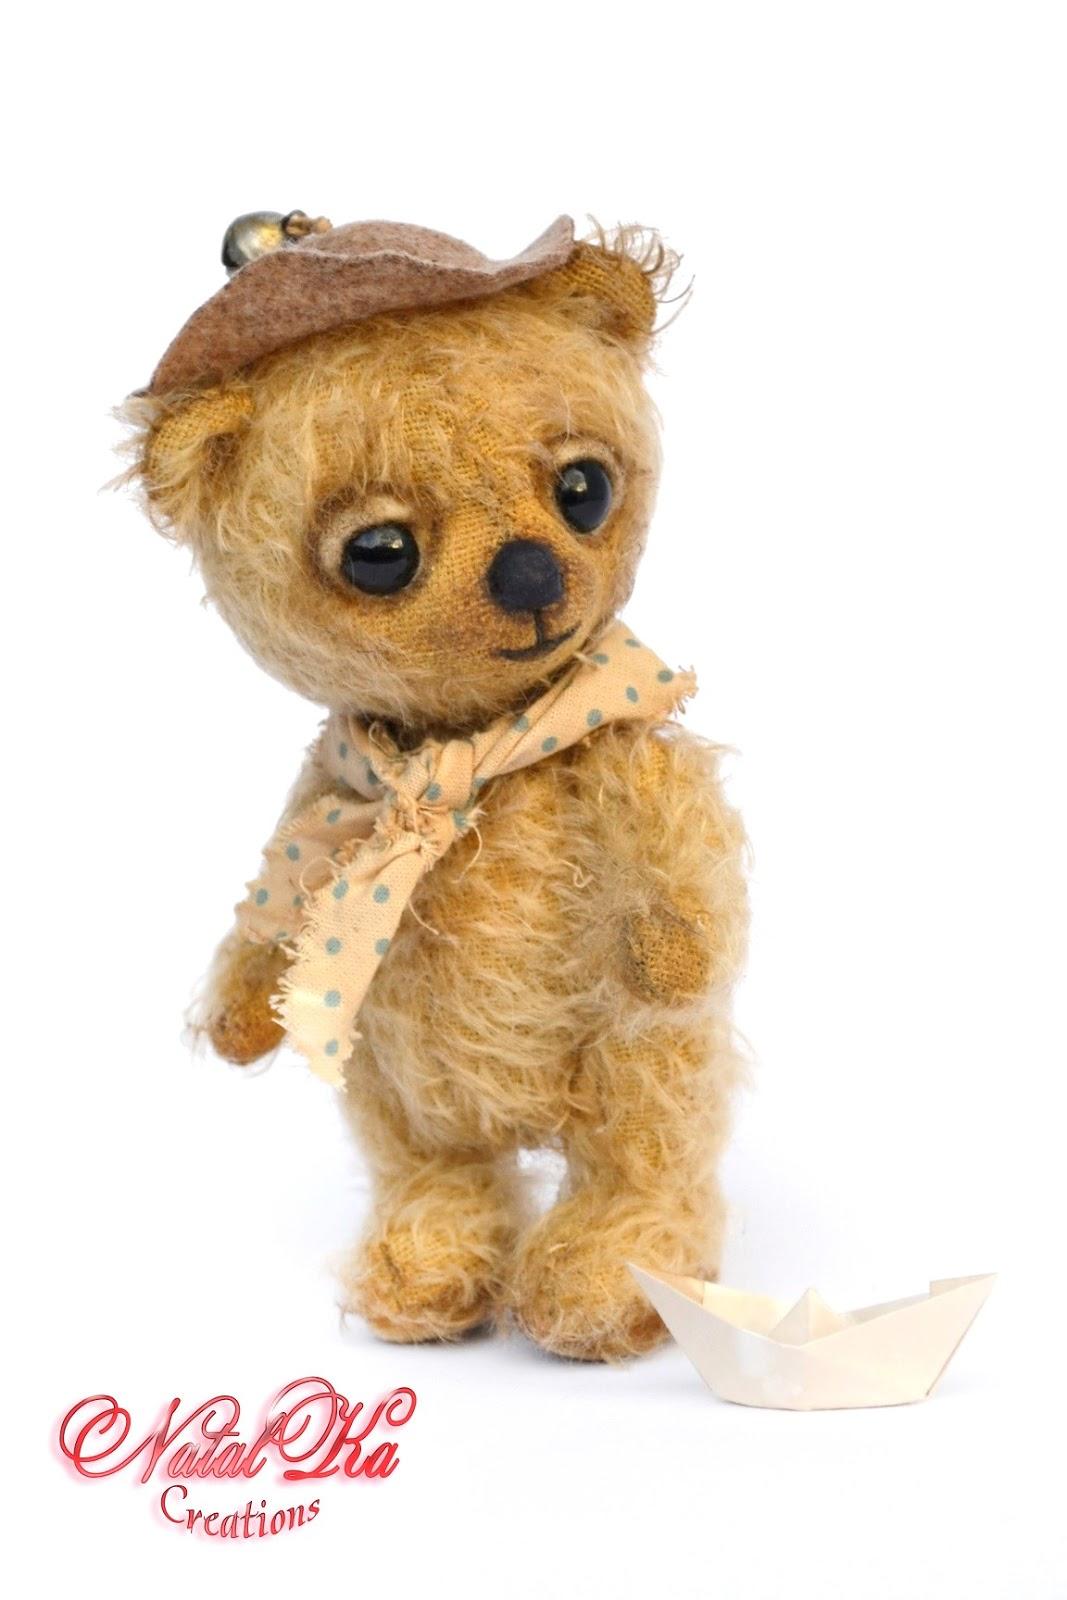 Artist teddy bear, artist bear, teddy bear, ooak, artist bear jointed, mohair, handmade by NatalKa Creations. Künstlerbär, Künstlerteddy, Teddybär, Teddy, Unikat, handgemacht von NatalKa Creations